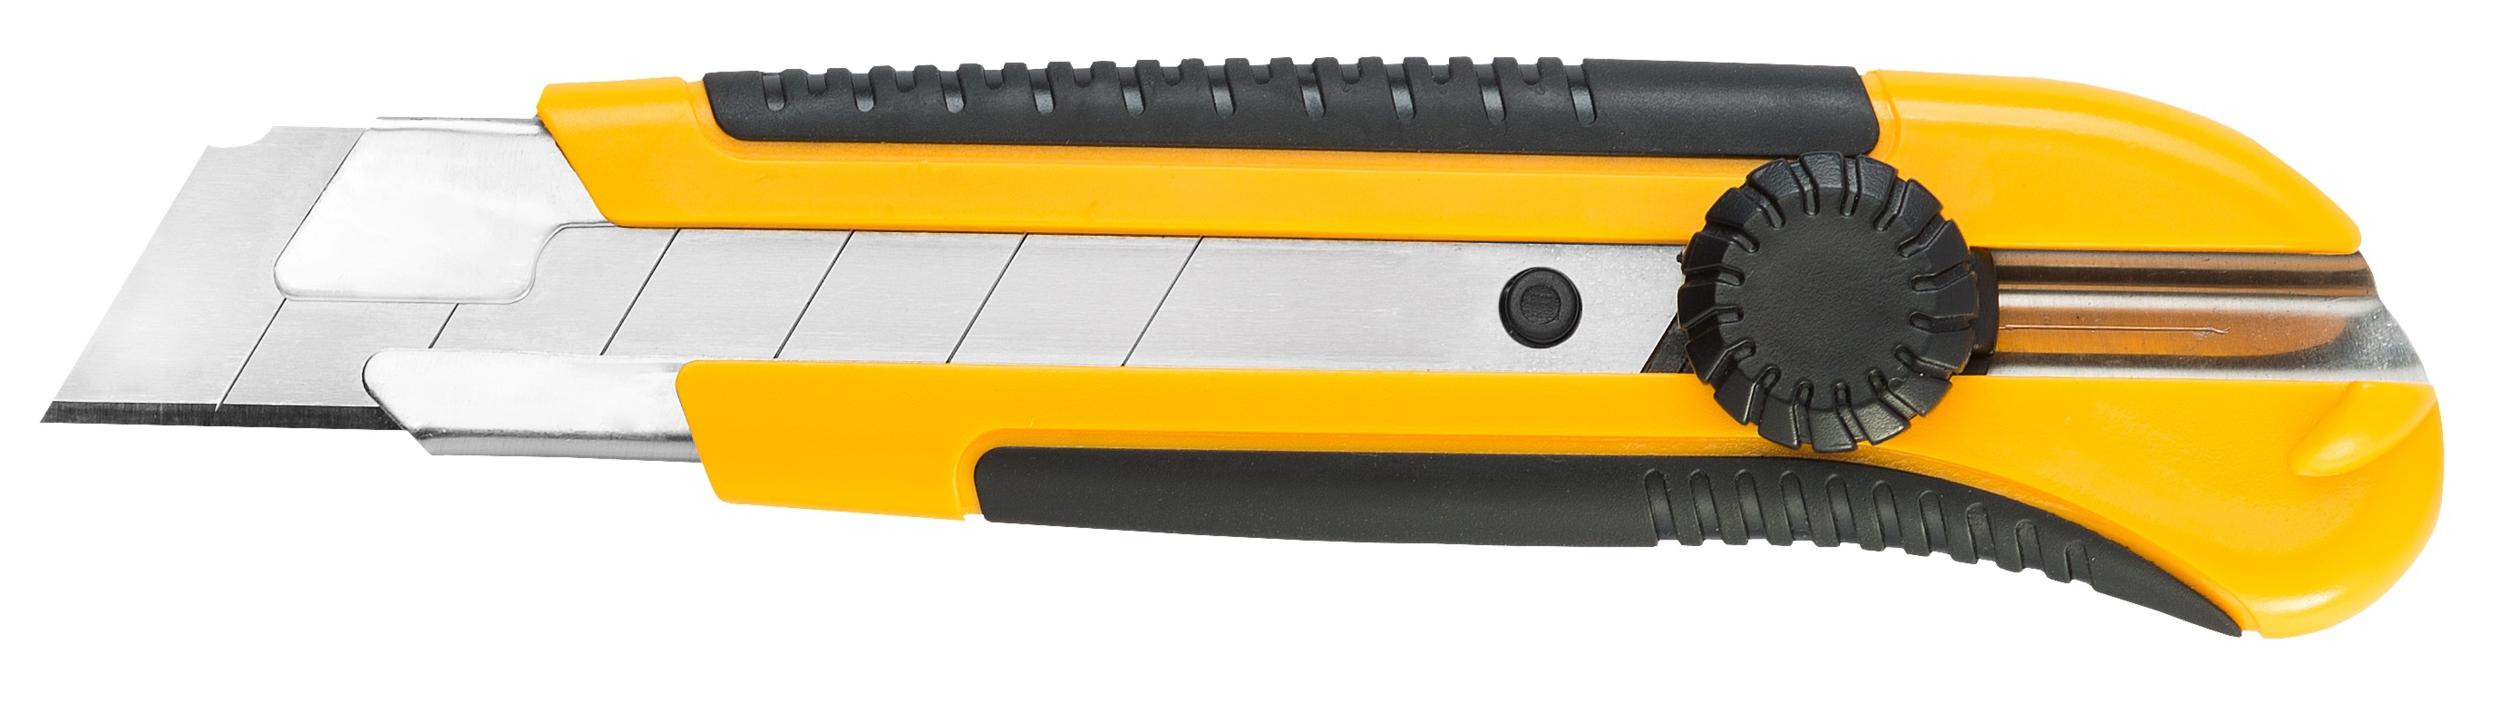 Cutter renforcé 25 mm Profi